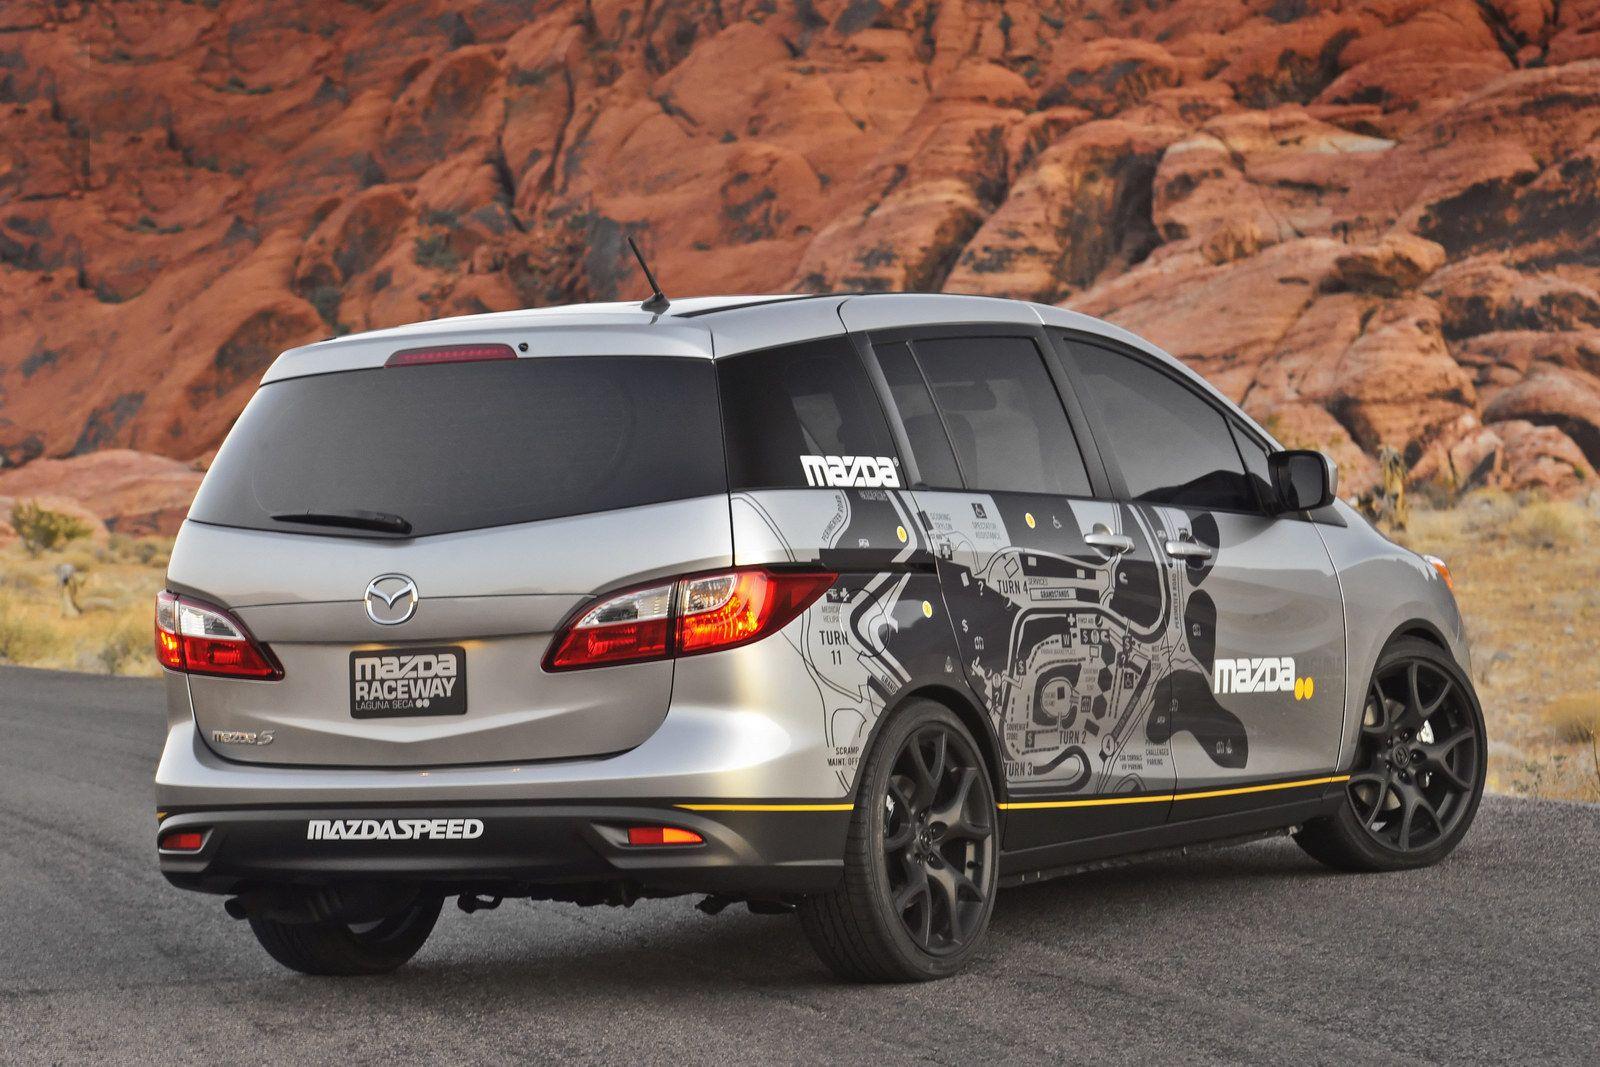 2011 Sema Show Debut For Mazda5 Laguna Seca Support Vehicle